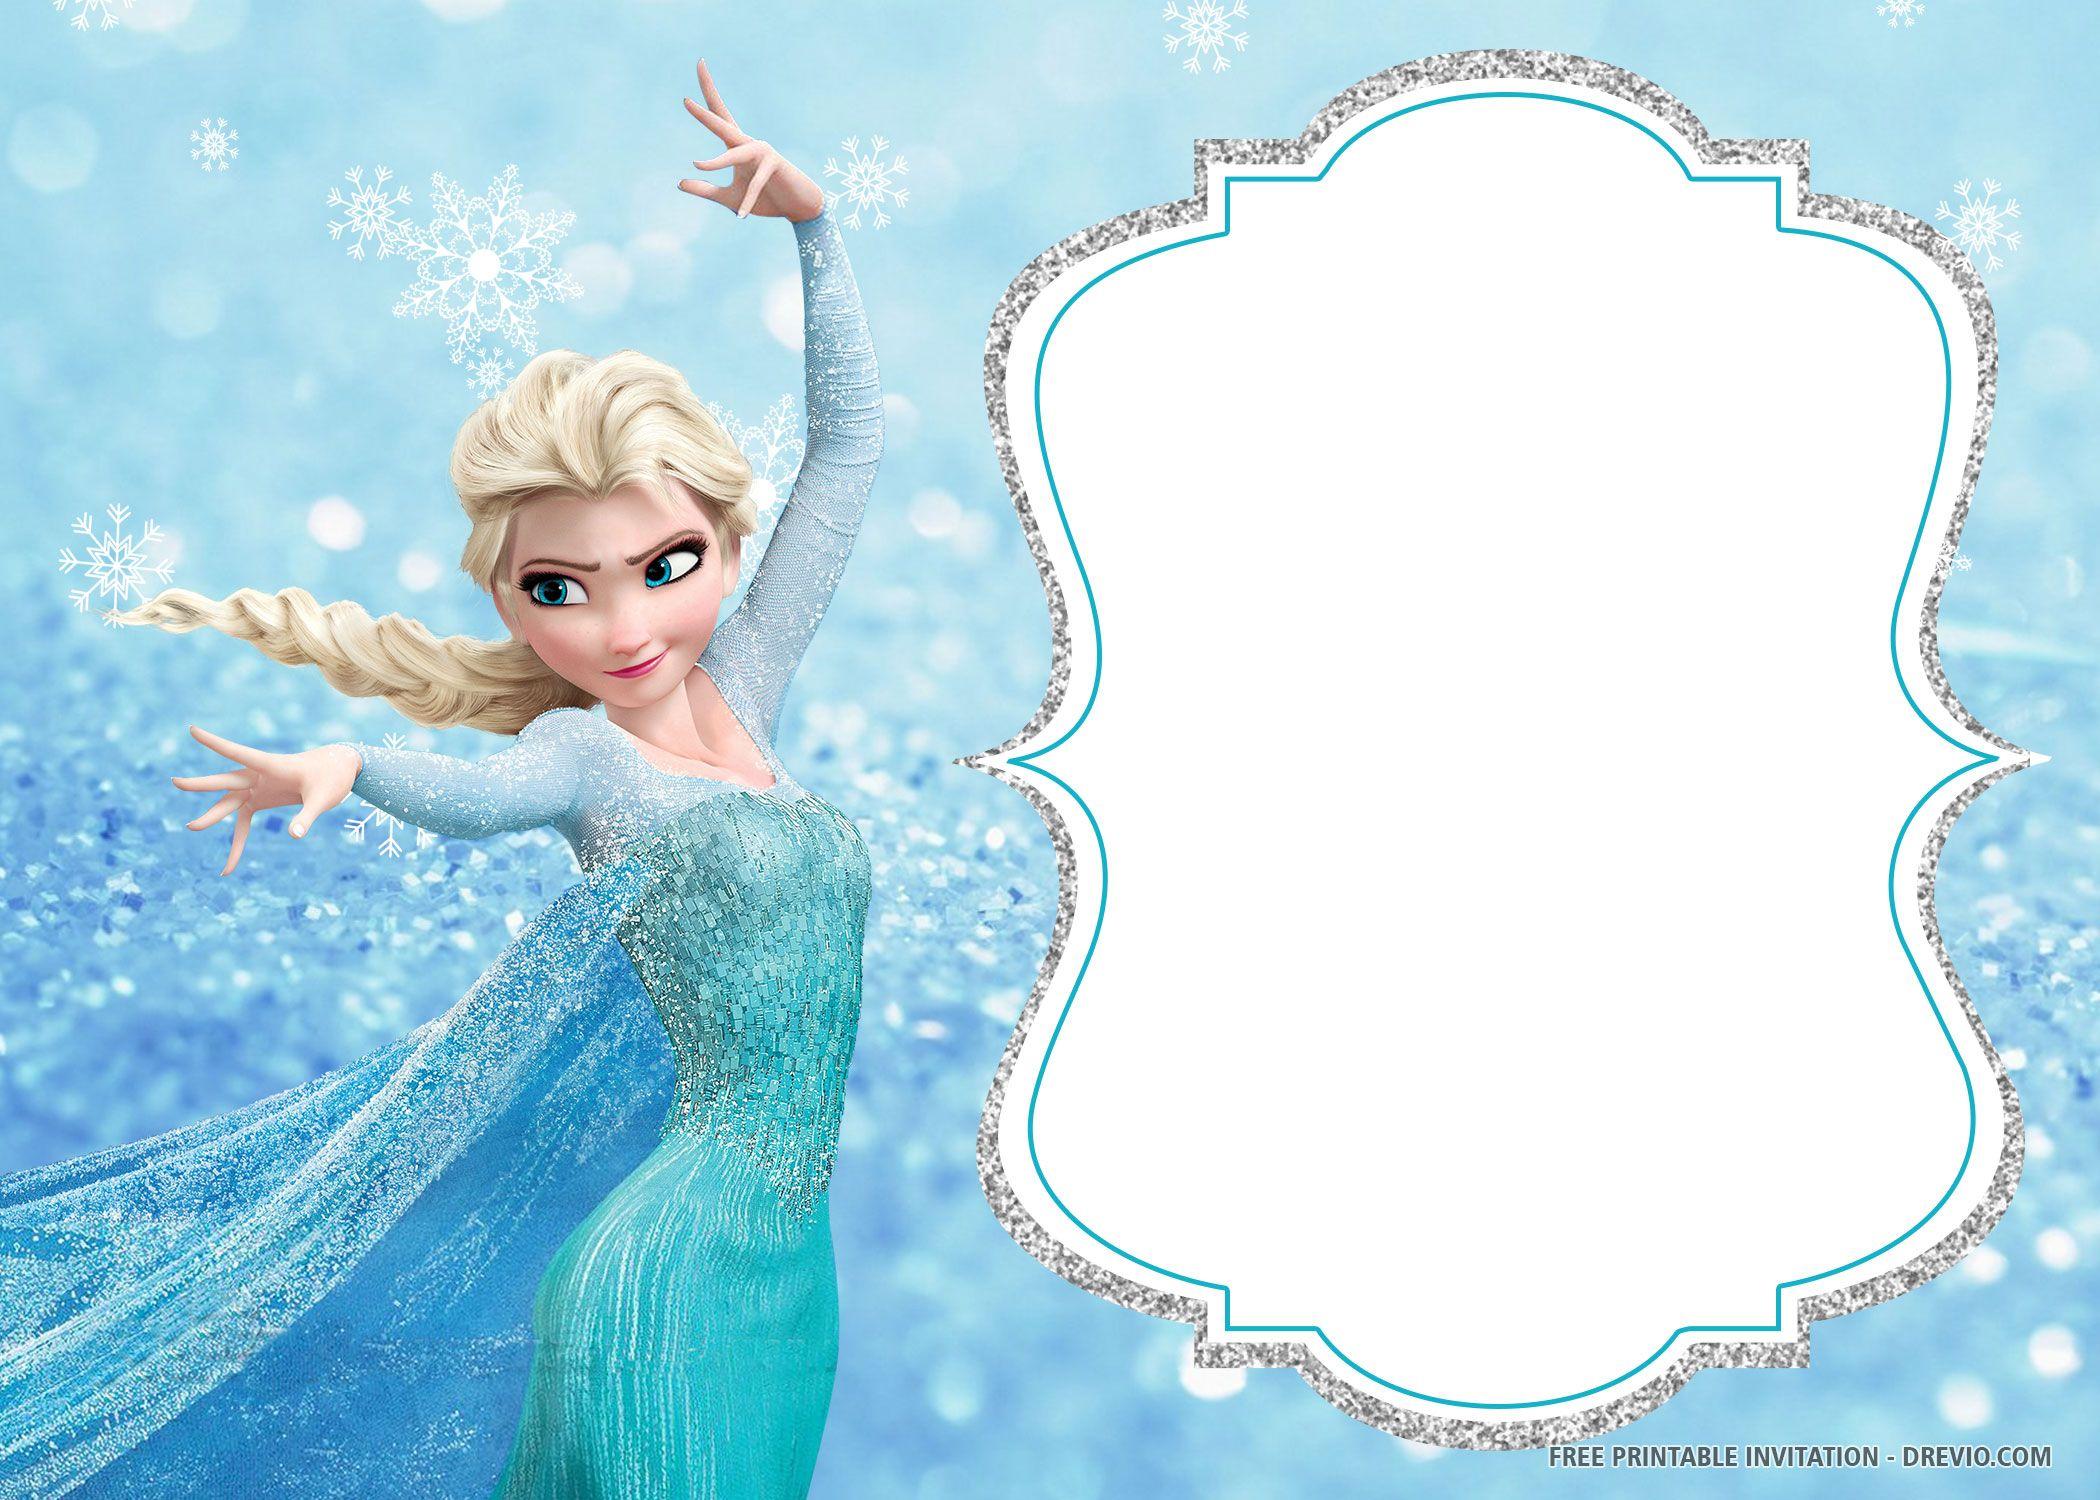 Free Printable Frozen Birthday Invitation Templates Frozen Birthday Invitations Frozen Invitations Frozen Birthday Cards